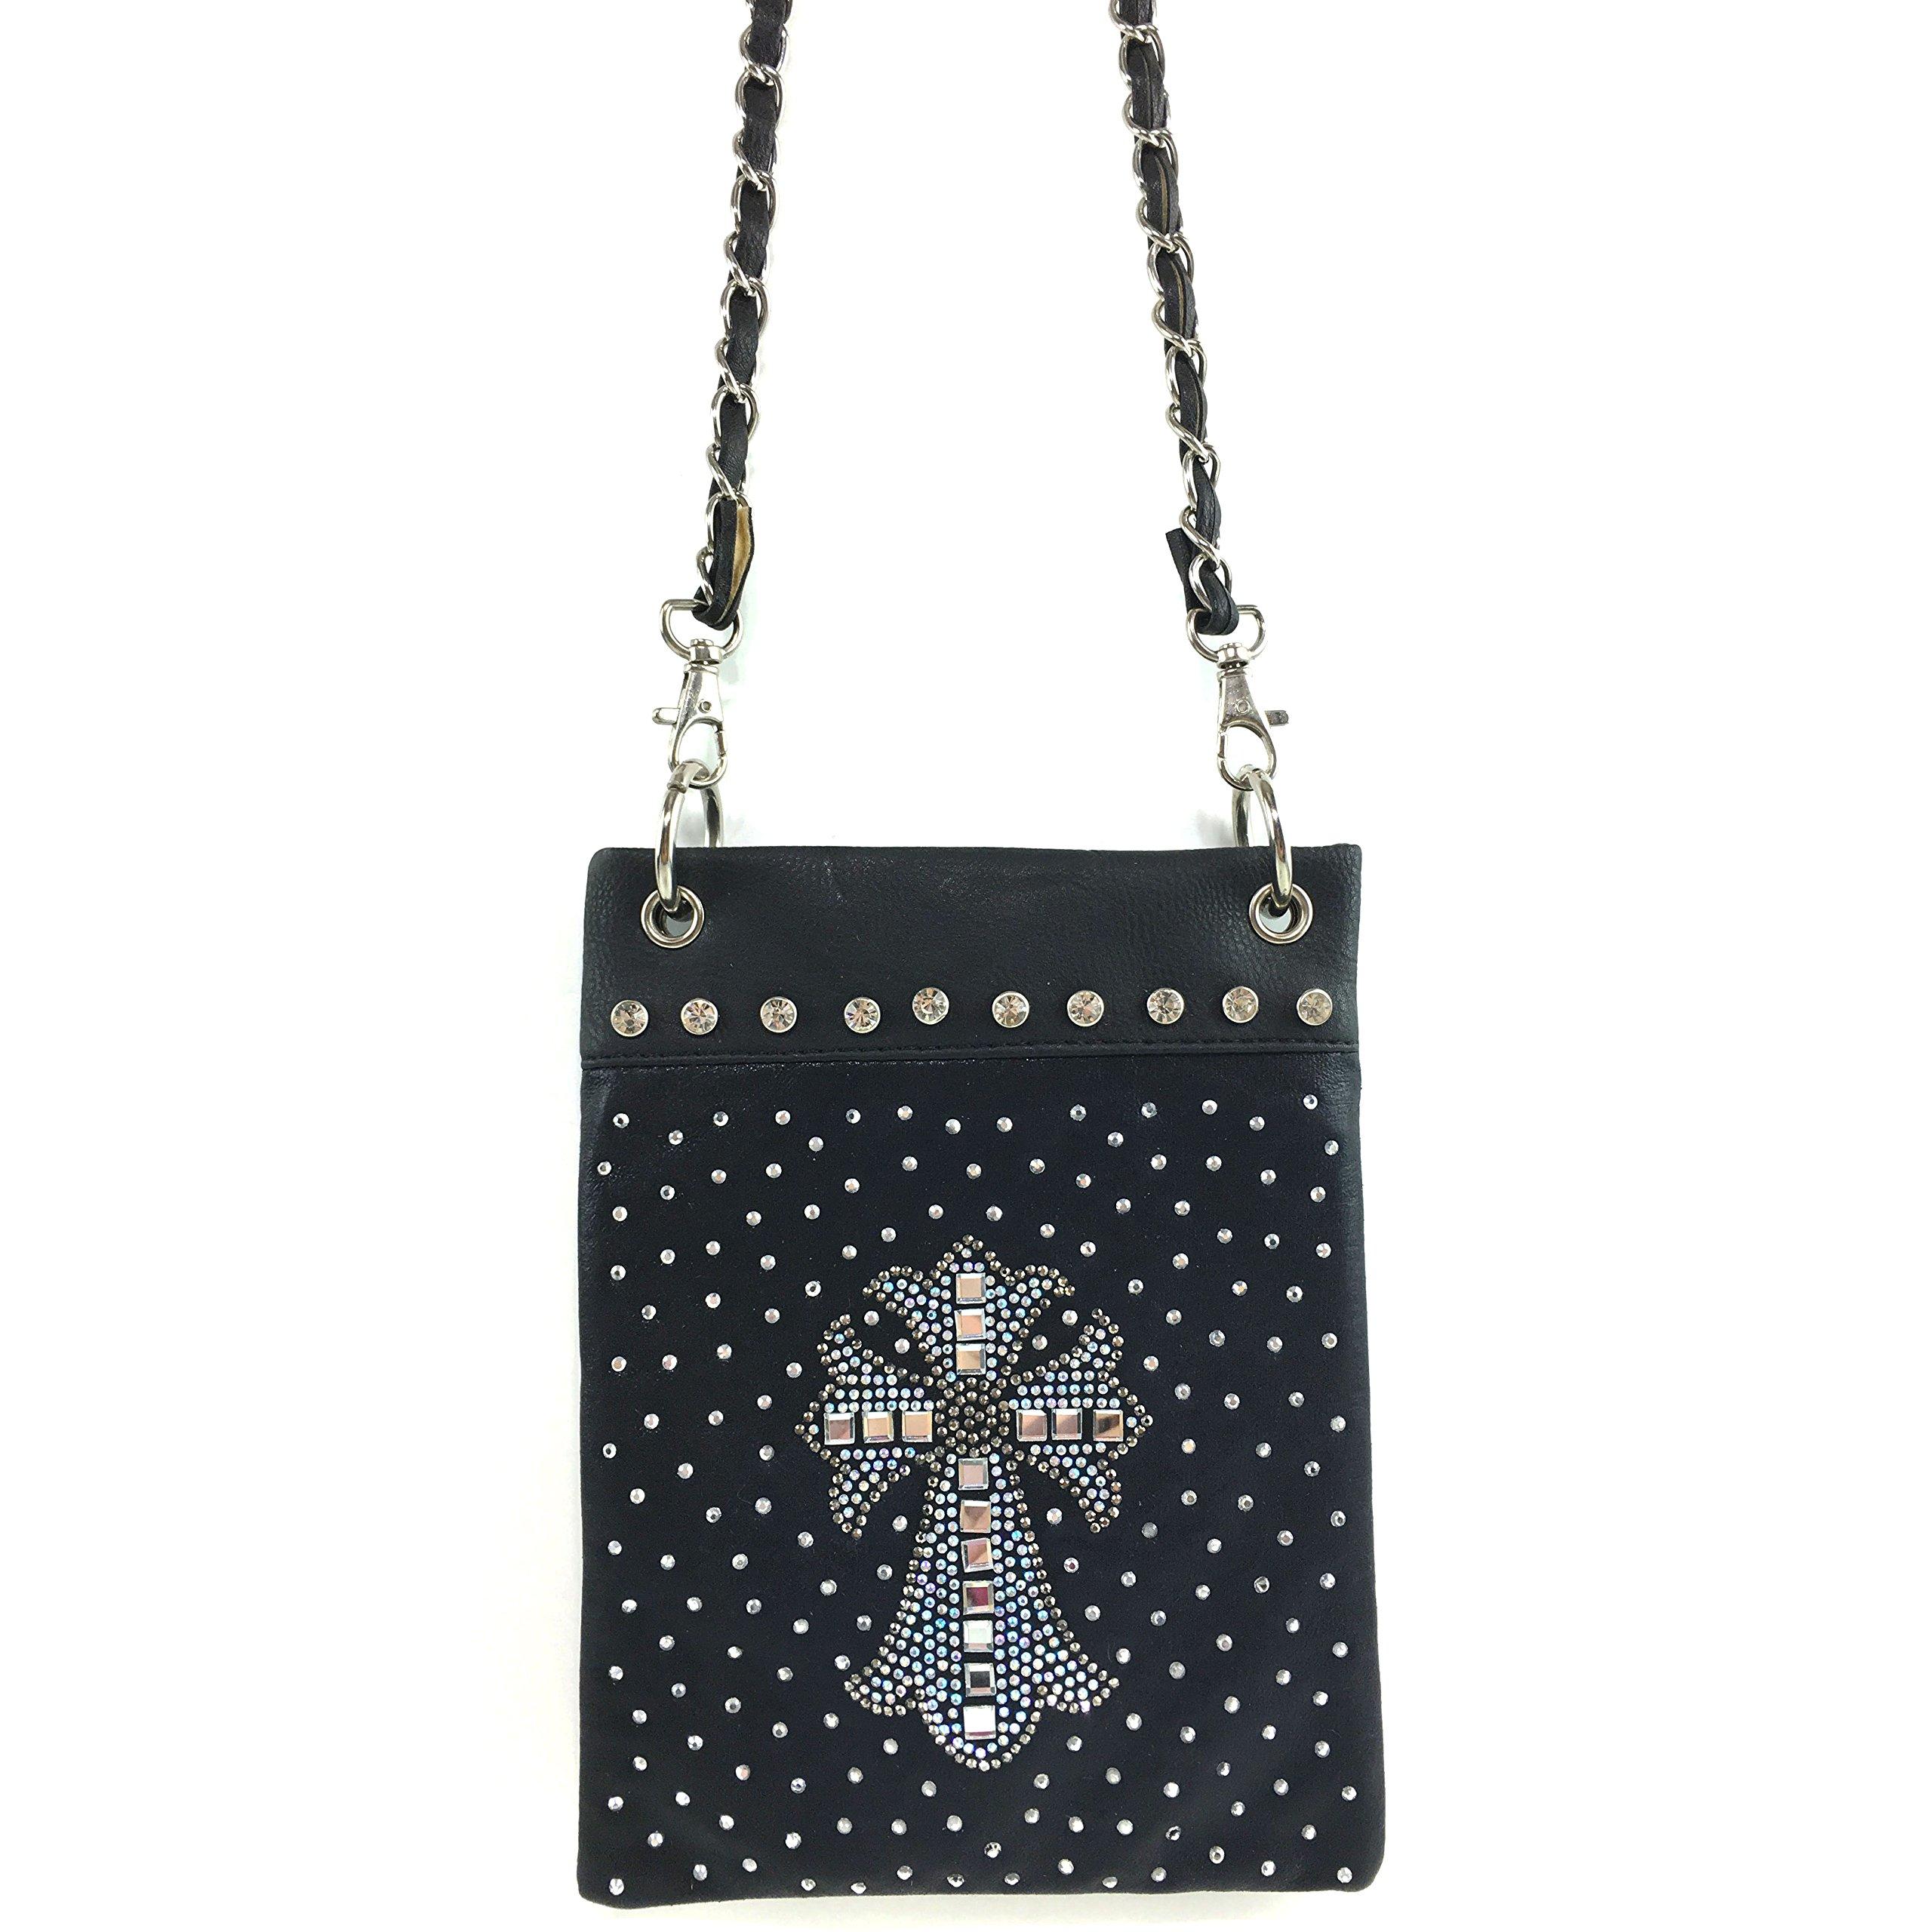 Justin West Concealed Carry Shiny Bling Gleaming Rhinestone Glass Cross Messenger Cross Body Handbag Purse (Black Mini Purse)